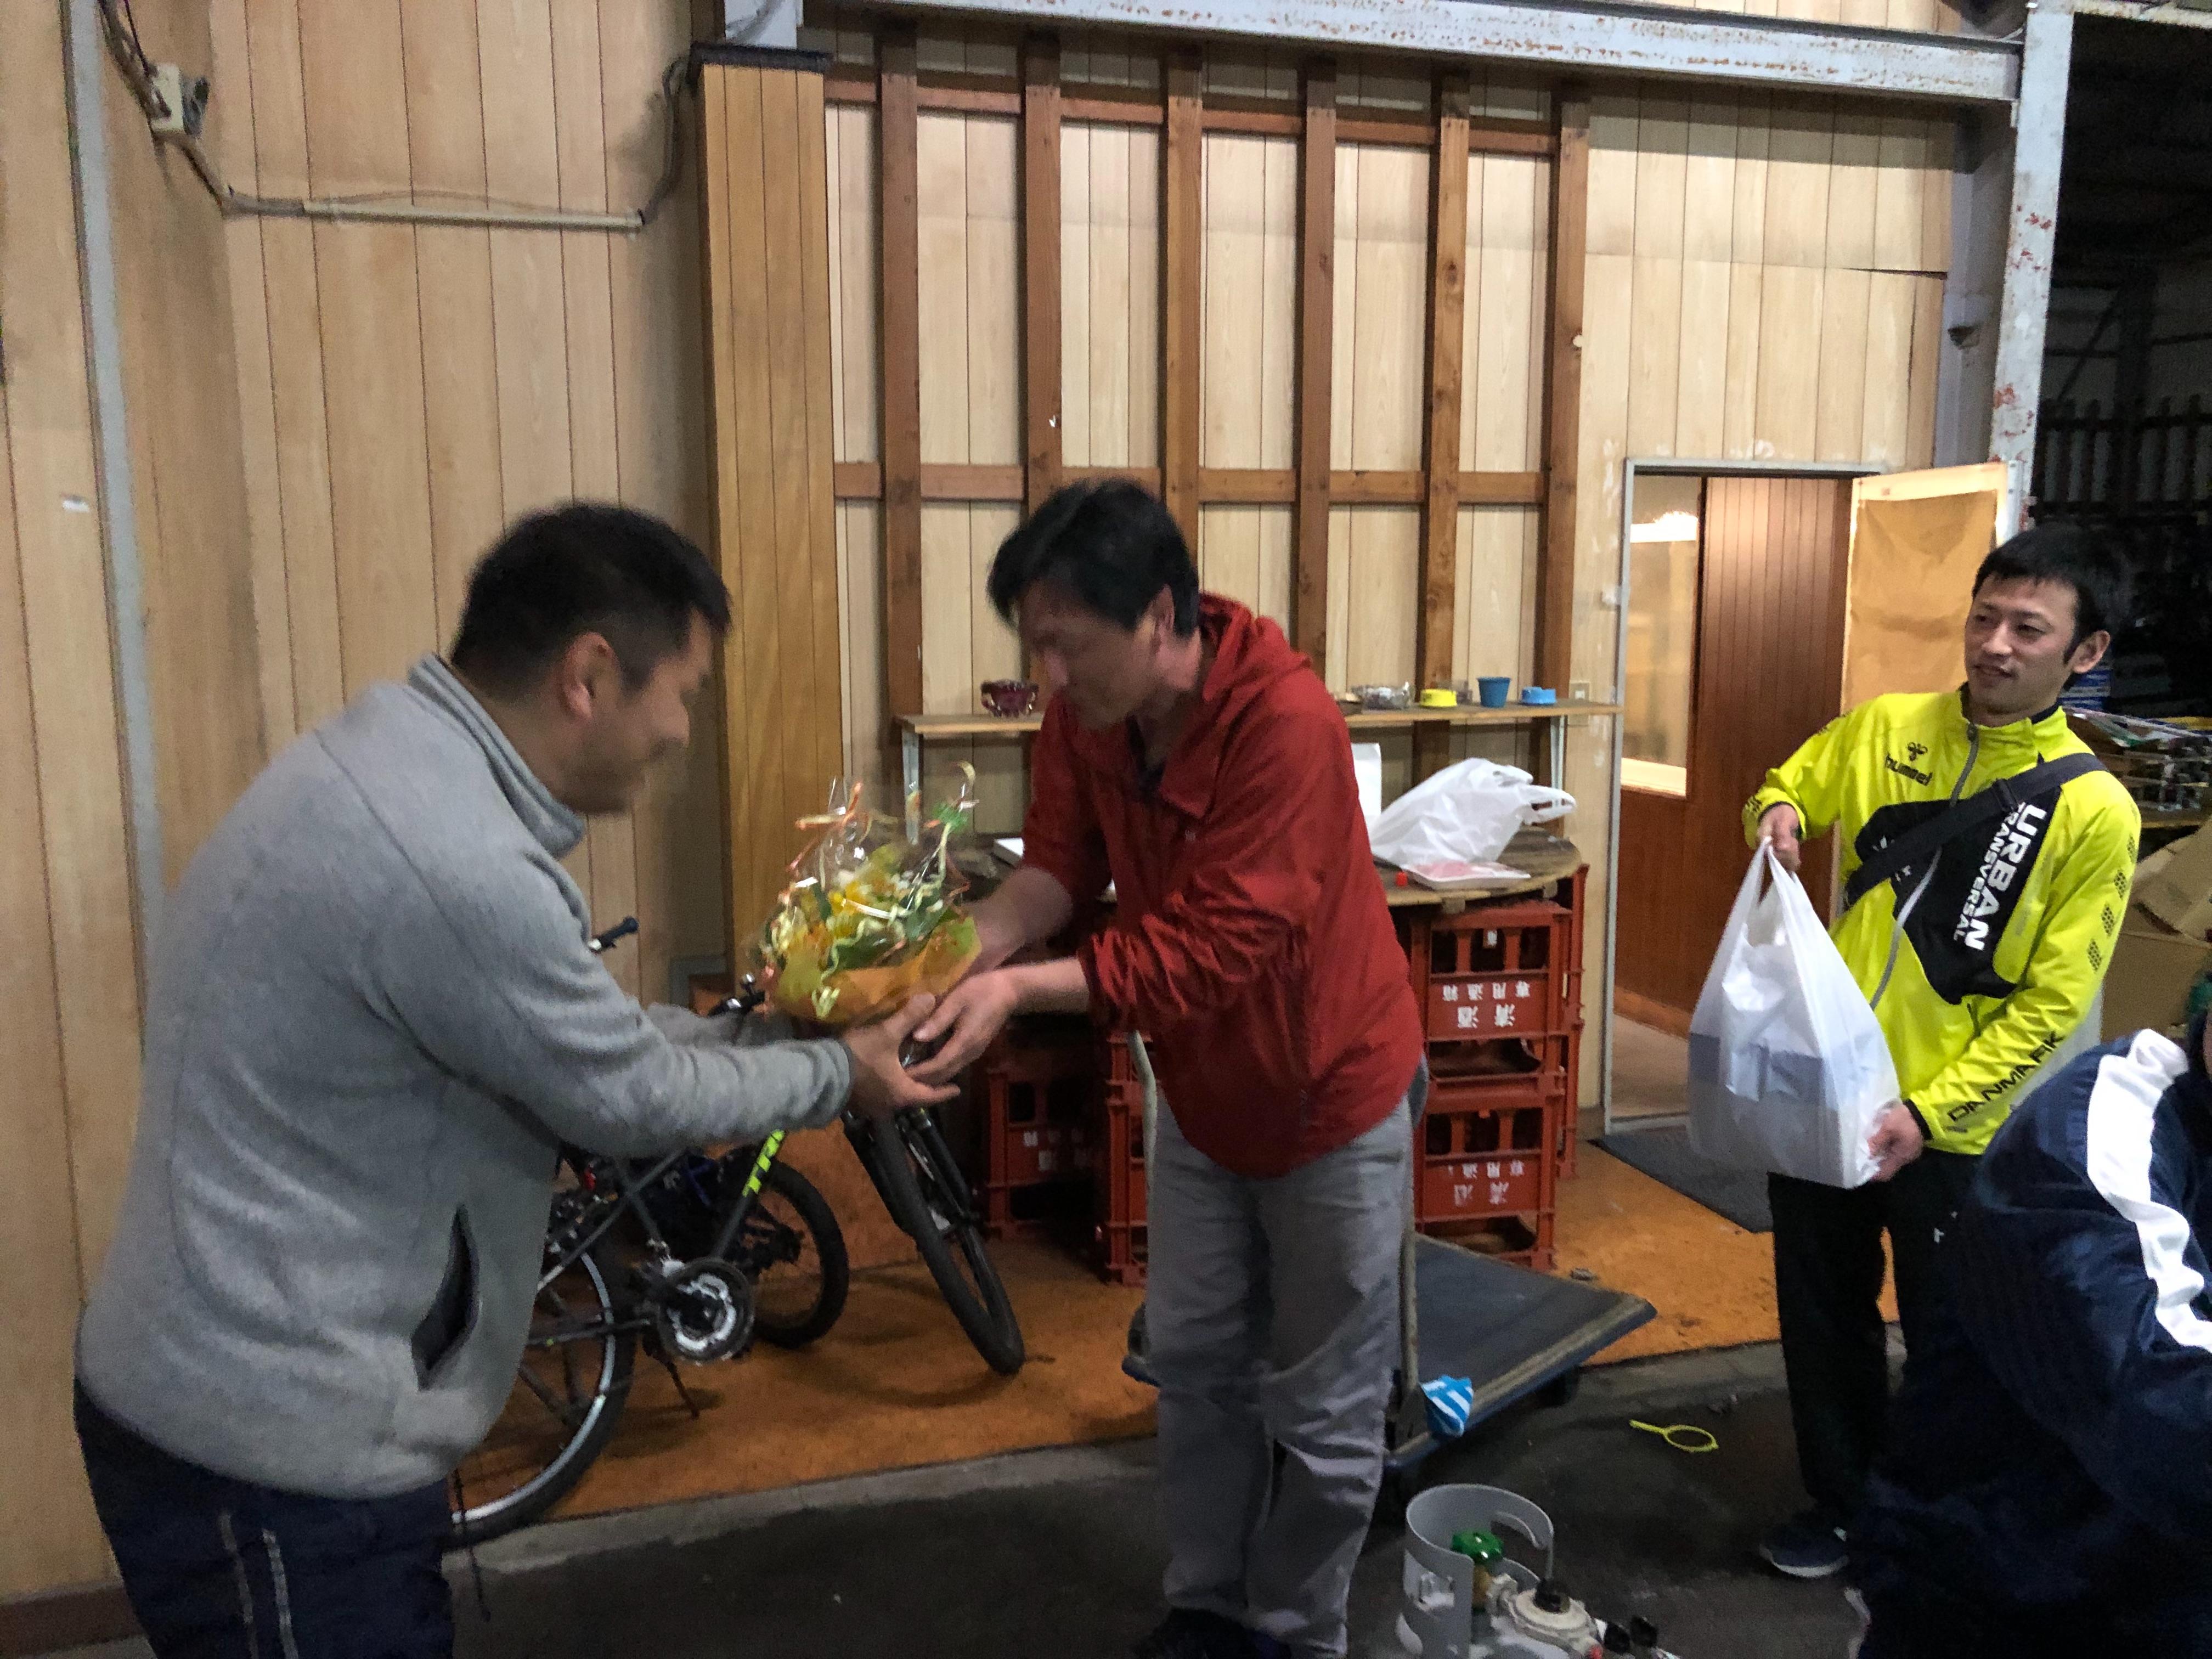 f:id:masanori-kato1972:20190322135657j:image